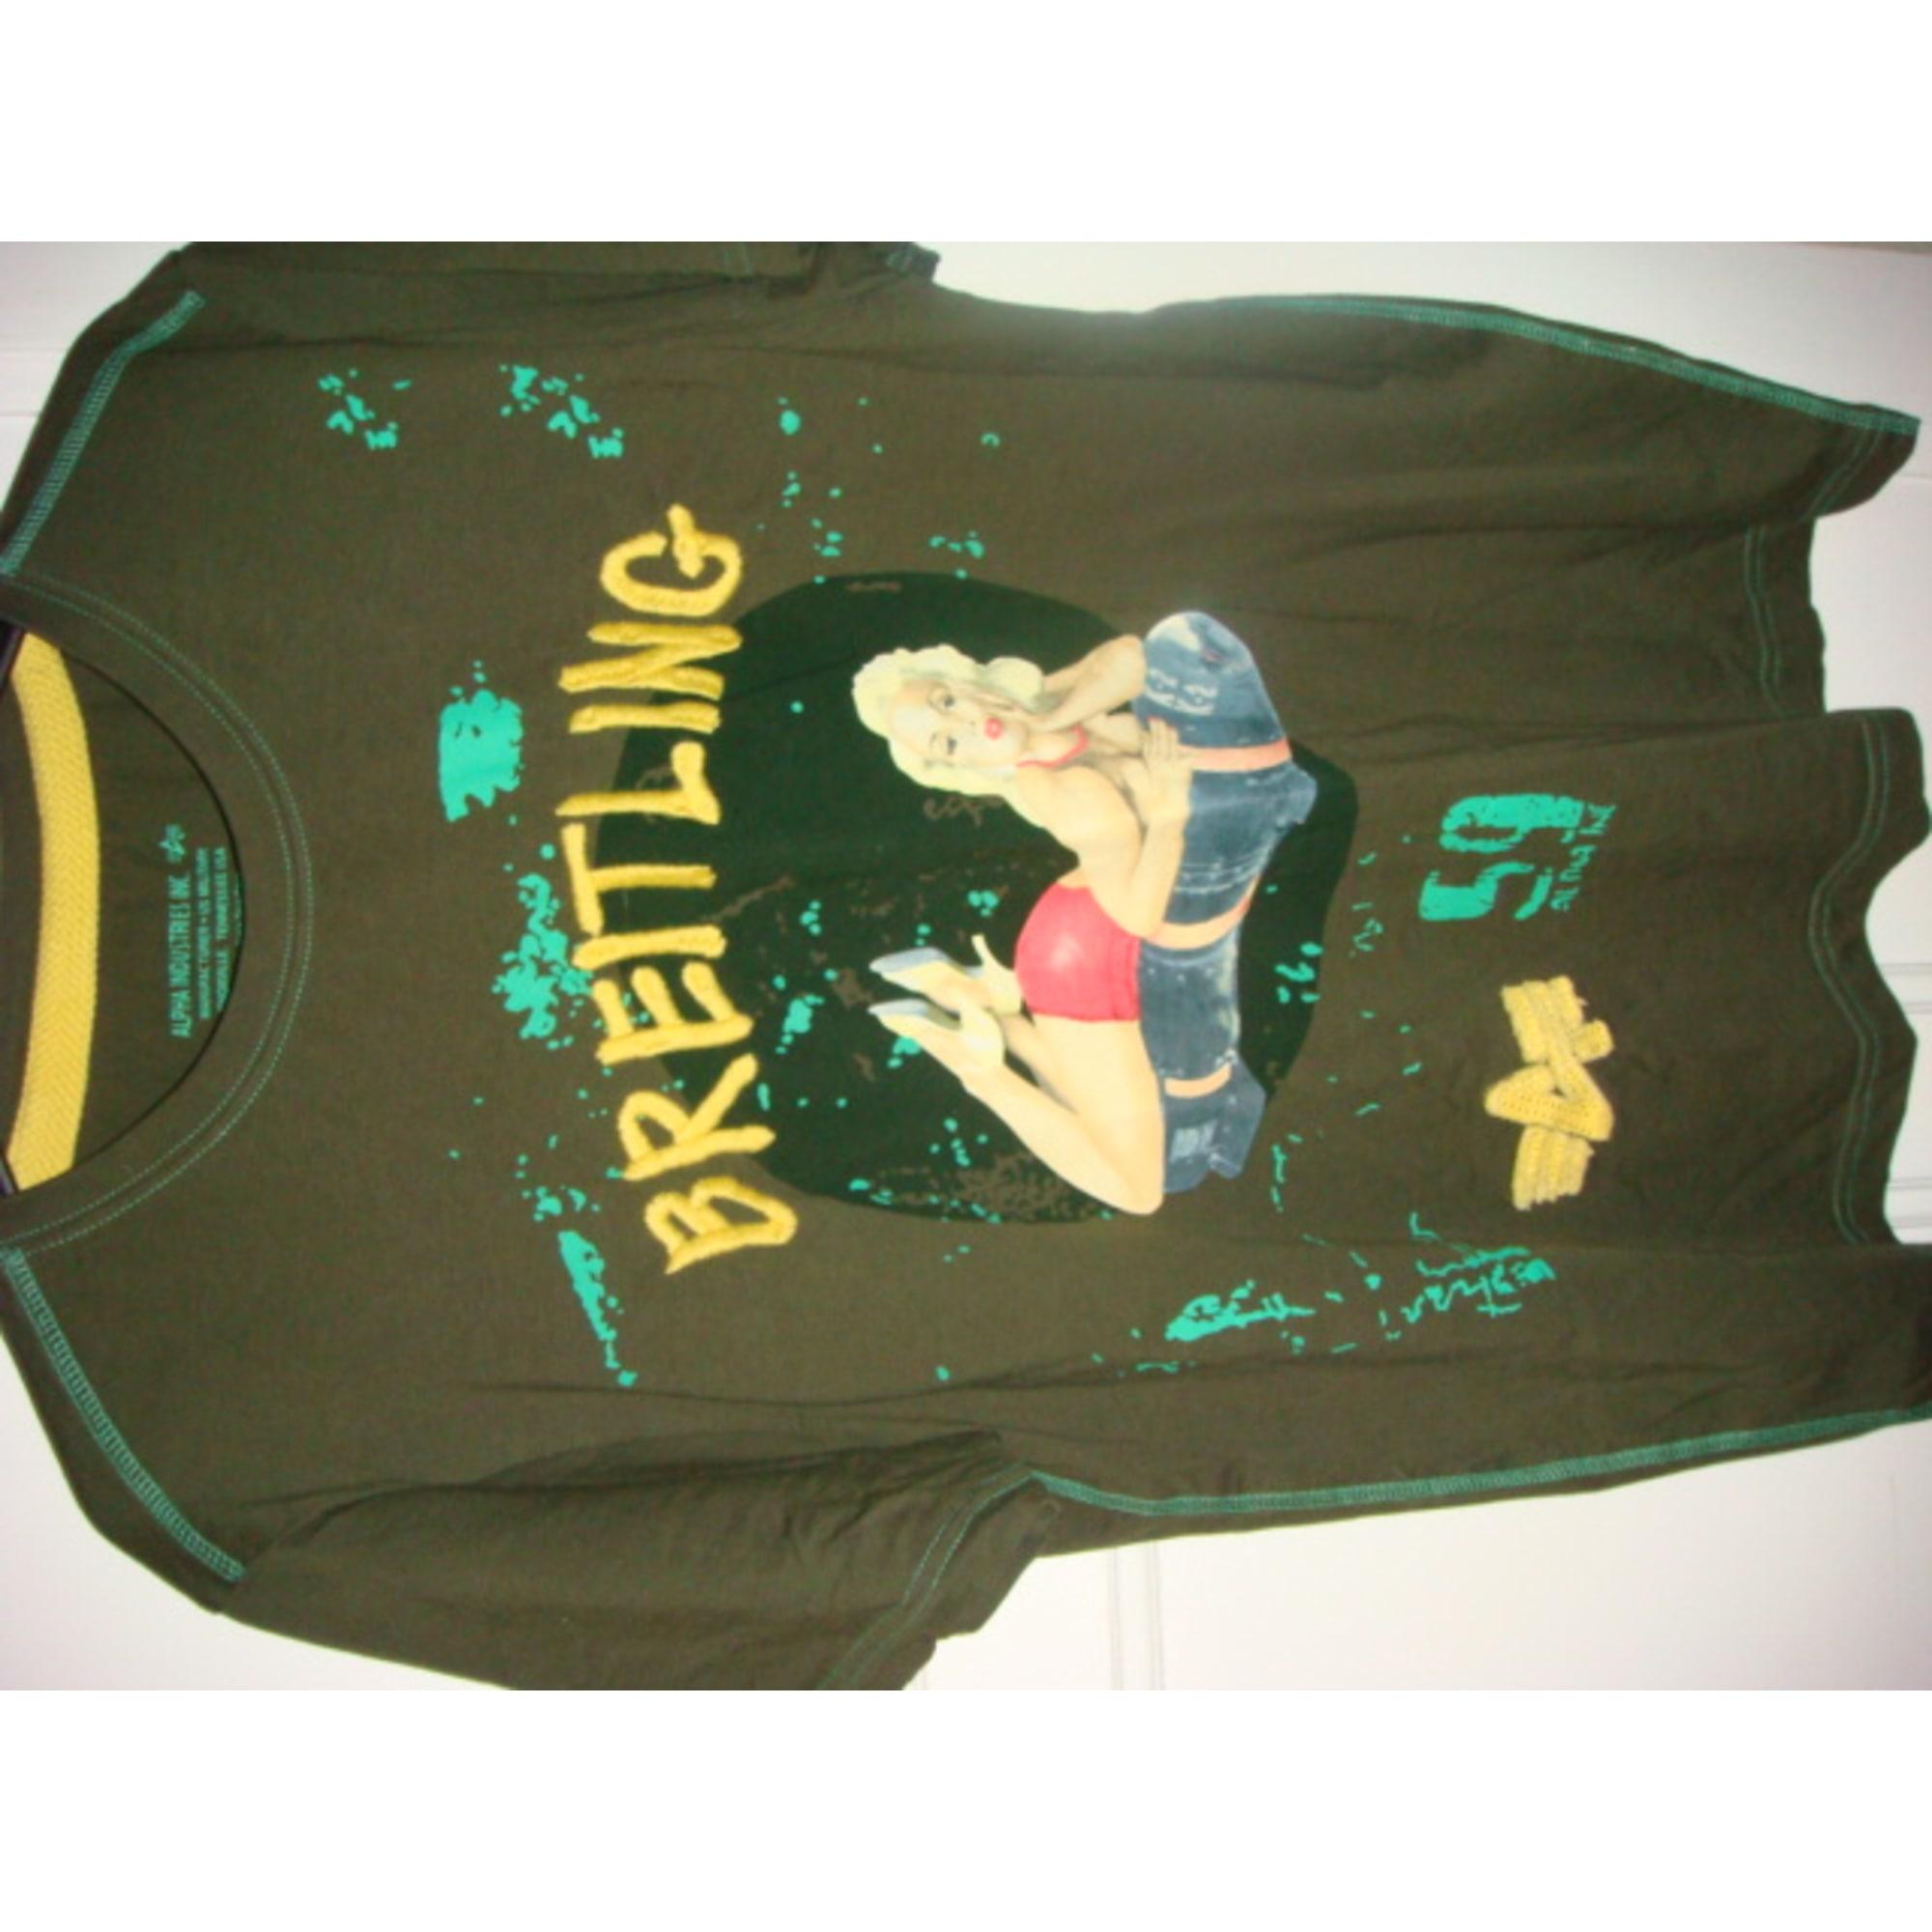 Shirt 3lKaki 3lKaki Tee Tee 2337125 Breitling Shirt Breitling UMVSpzqLG